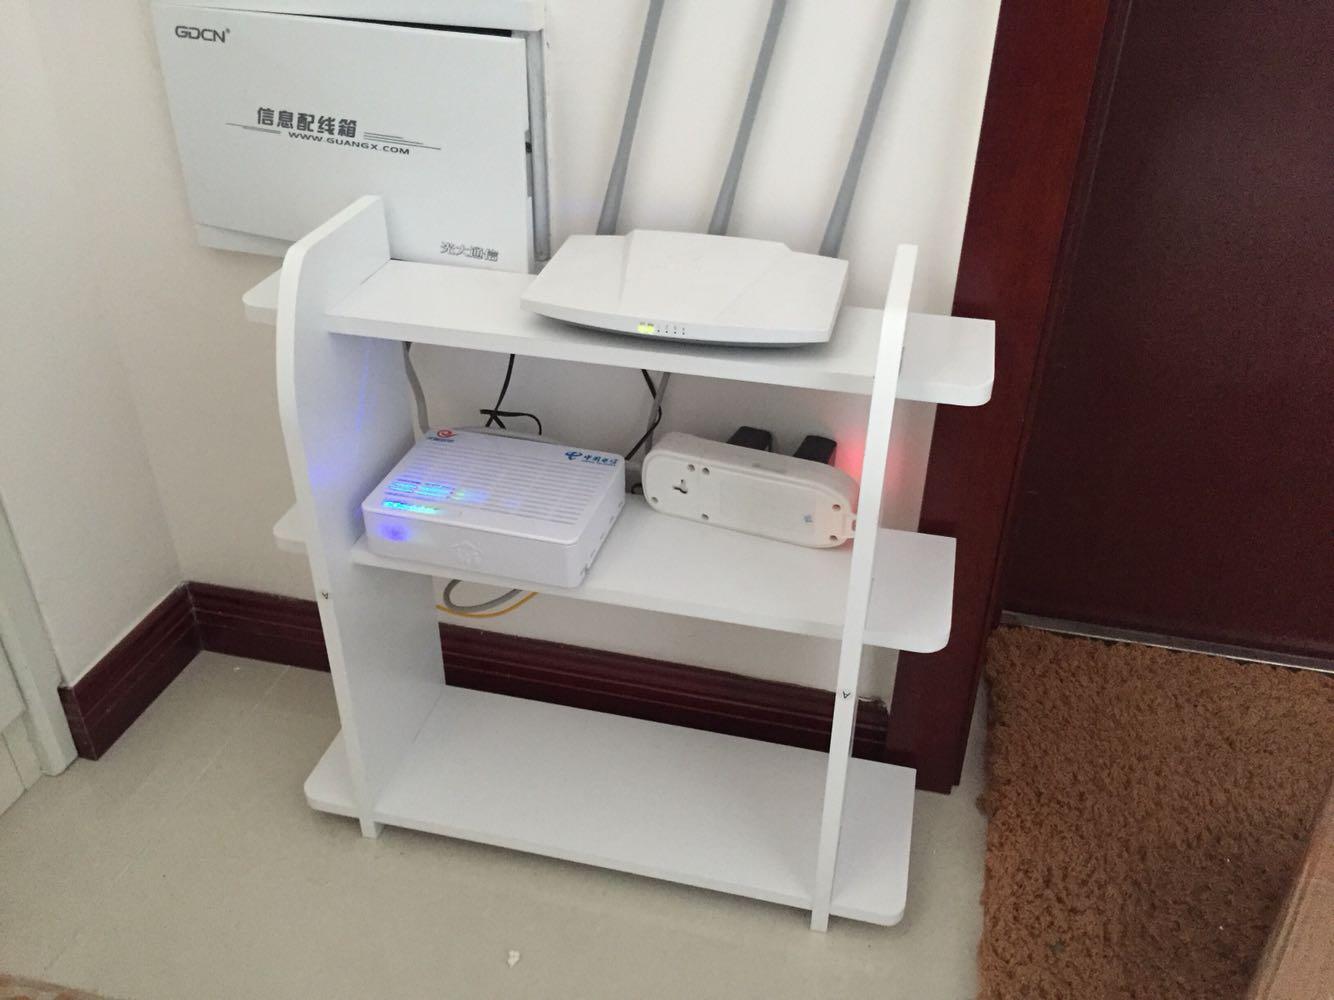 nike fuelband buy online 00240470 onlineshop